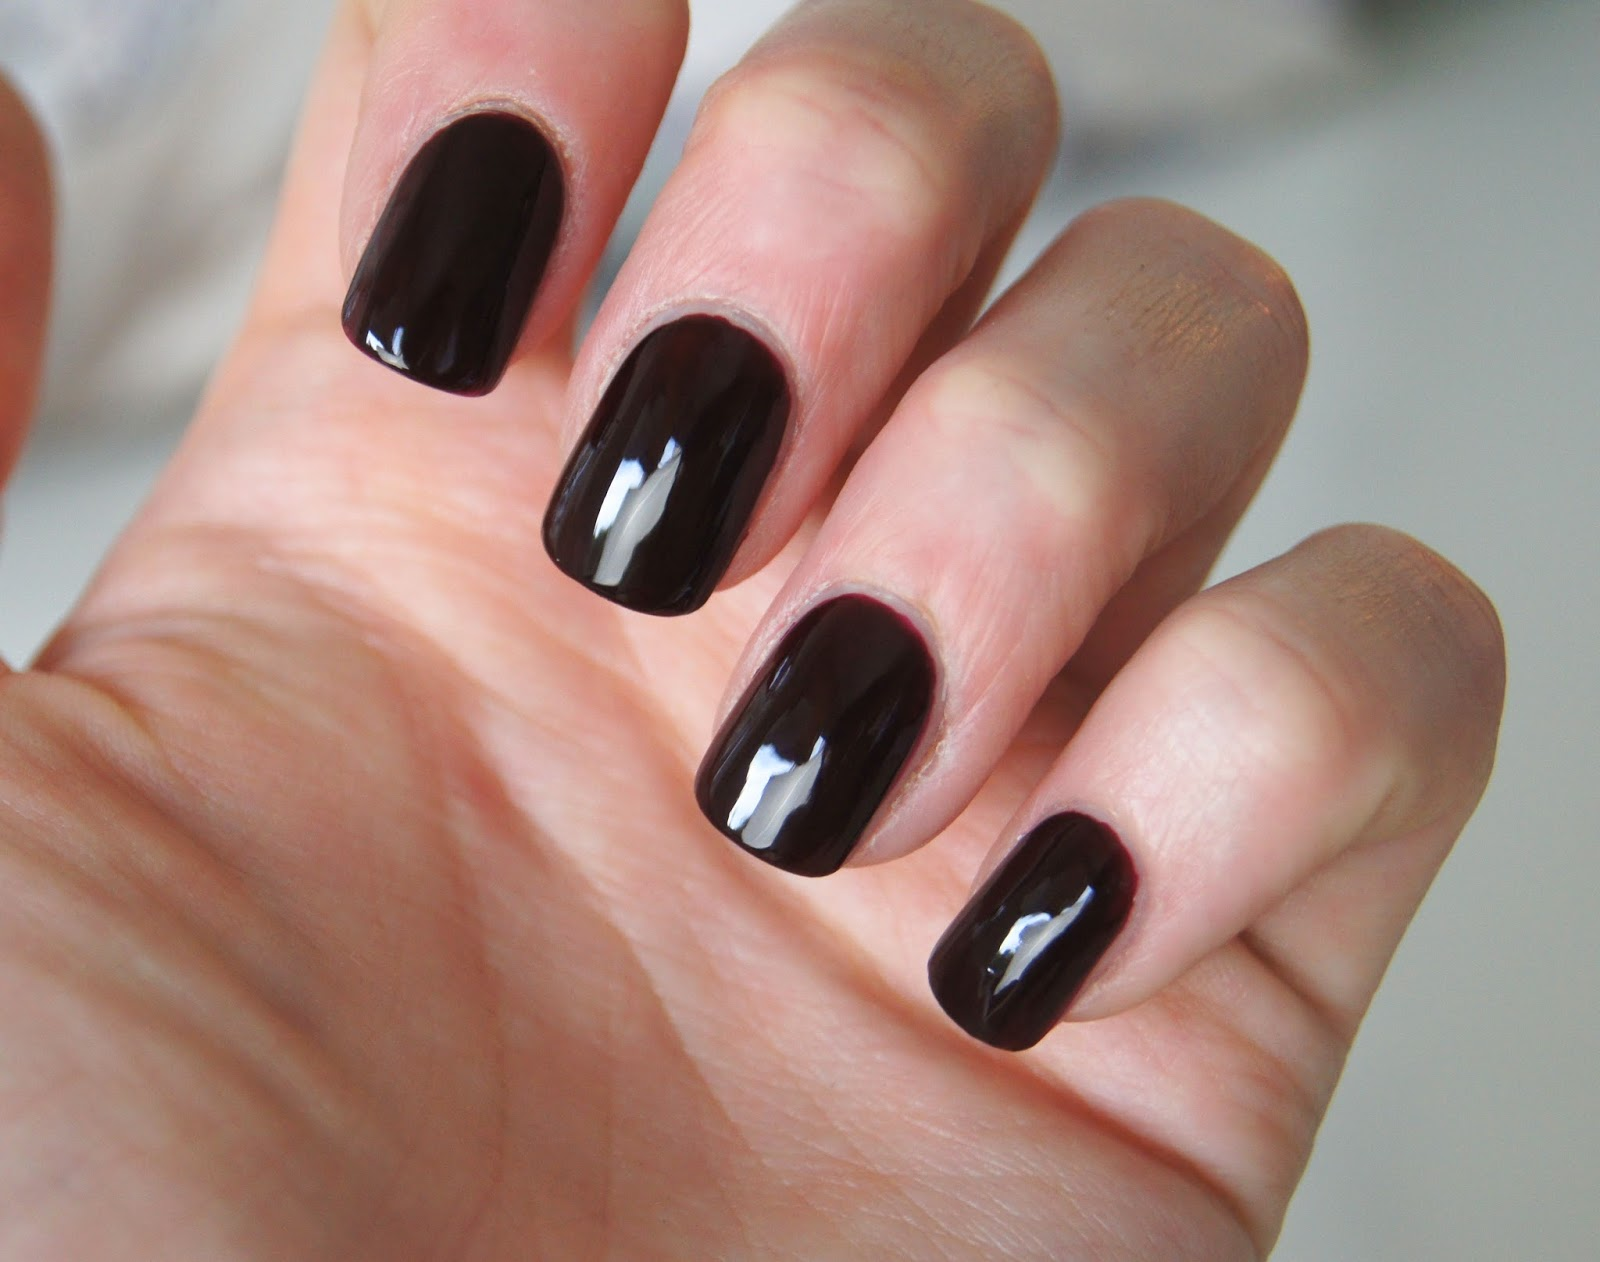 nails inc nail kale polish victoria swatch